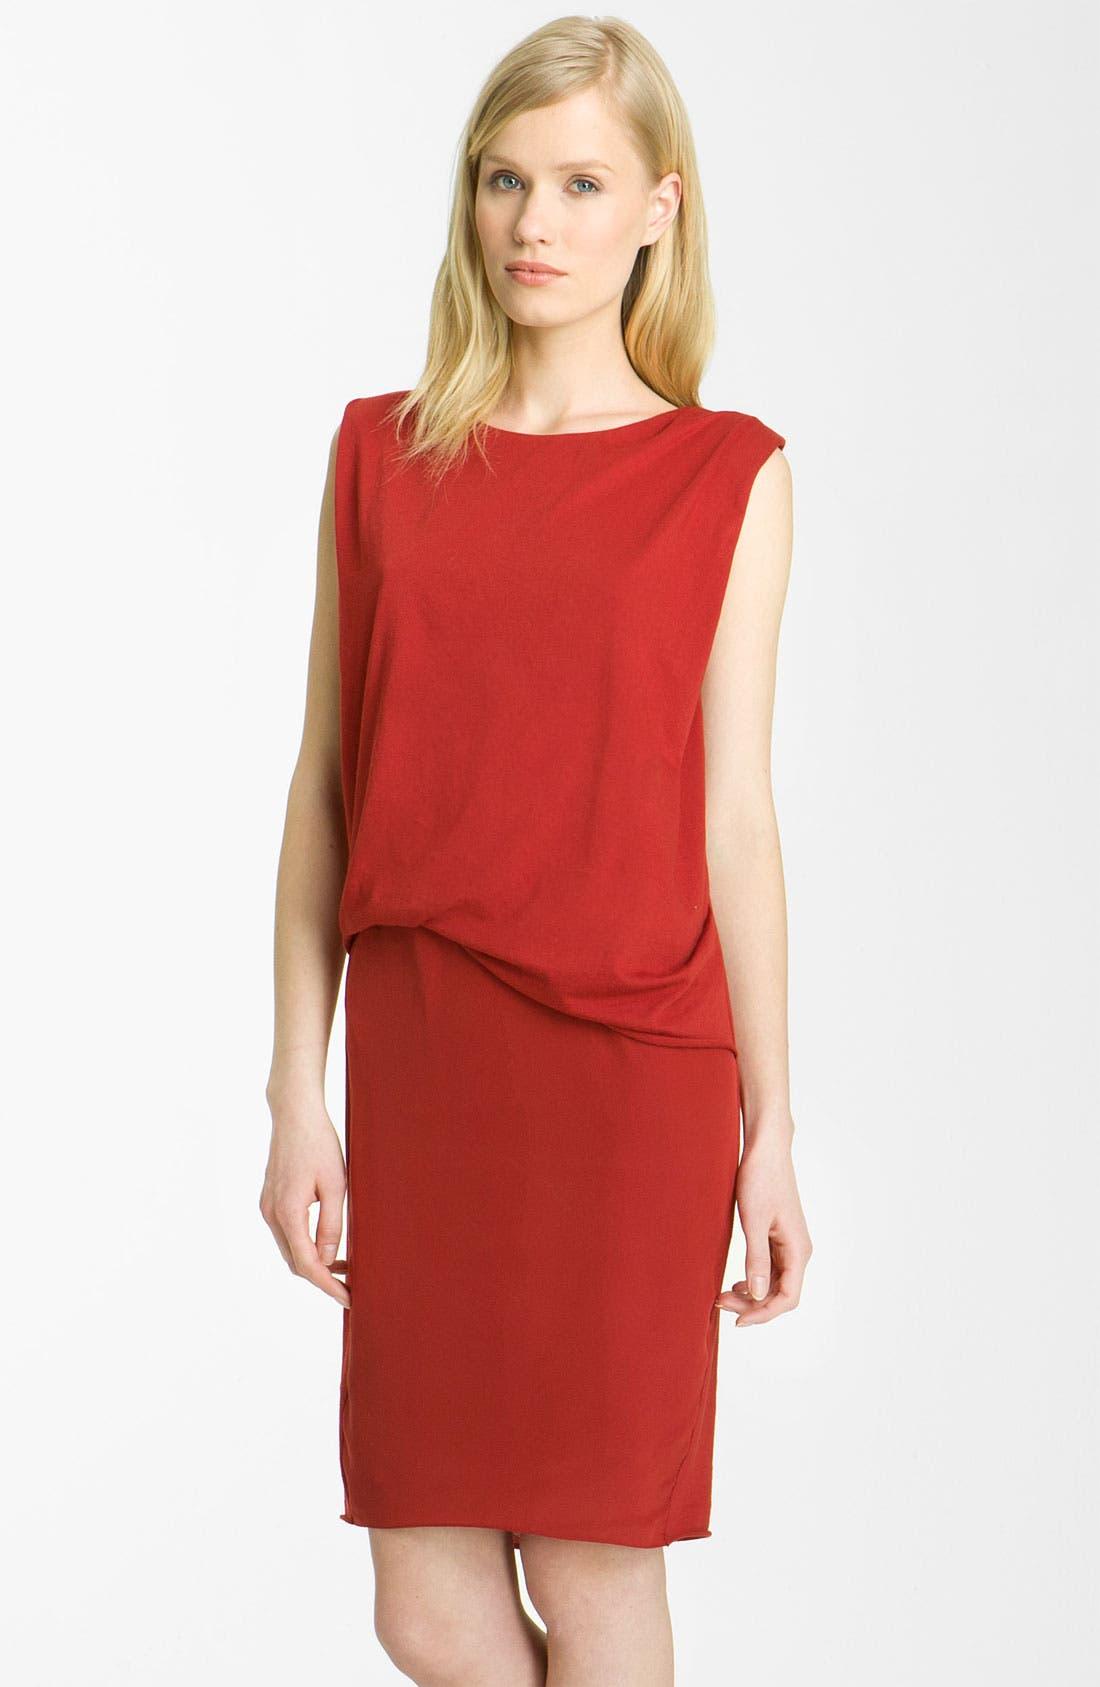 Main Image - 3.1 Phillip Lim Knit Dress